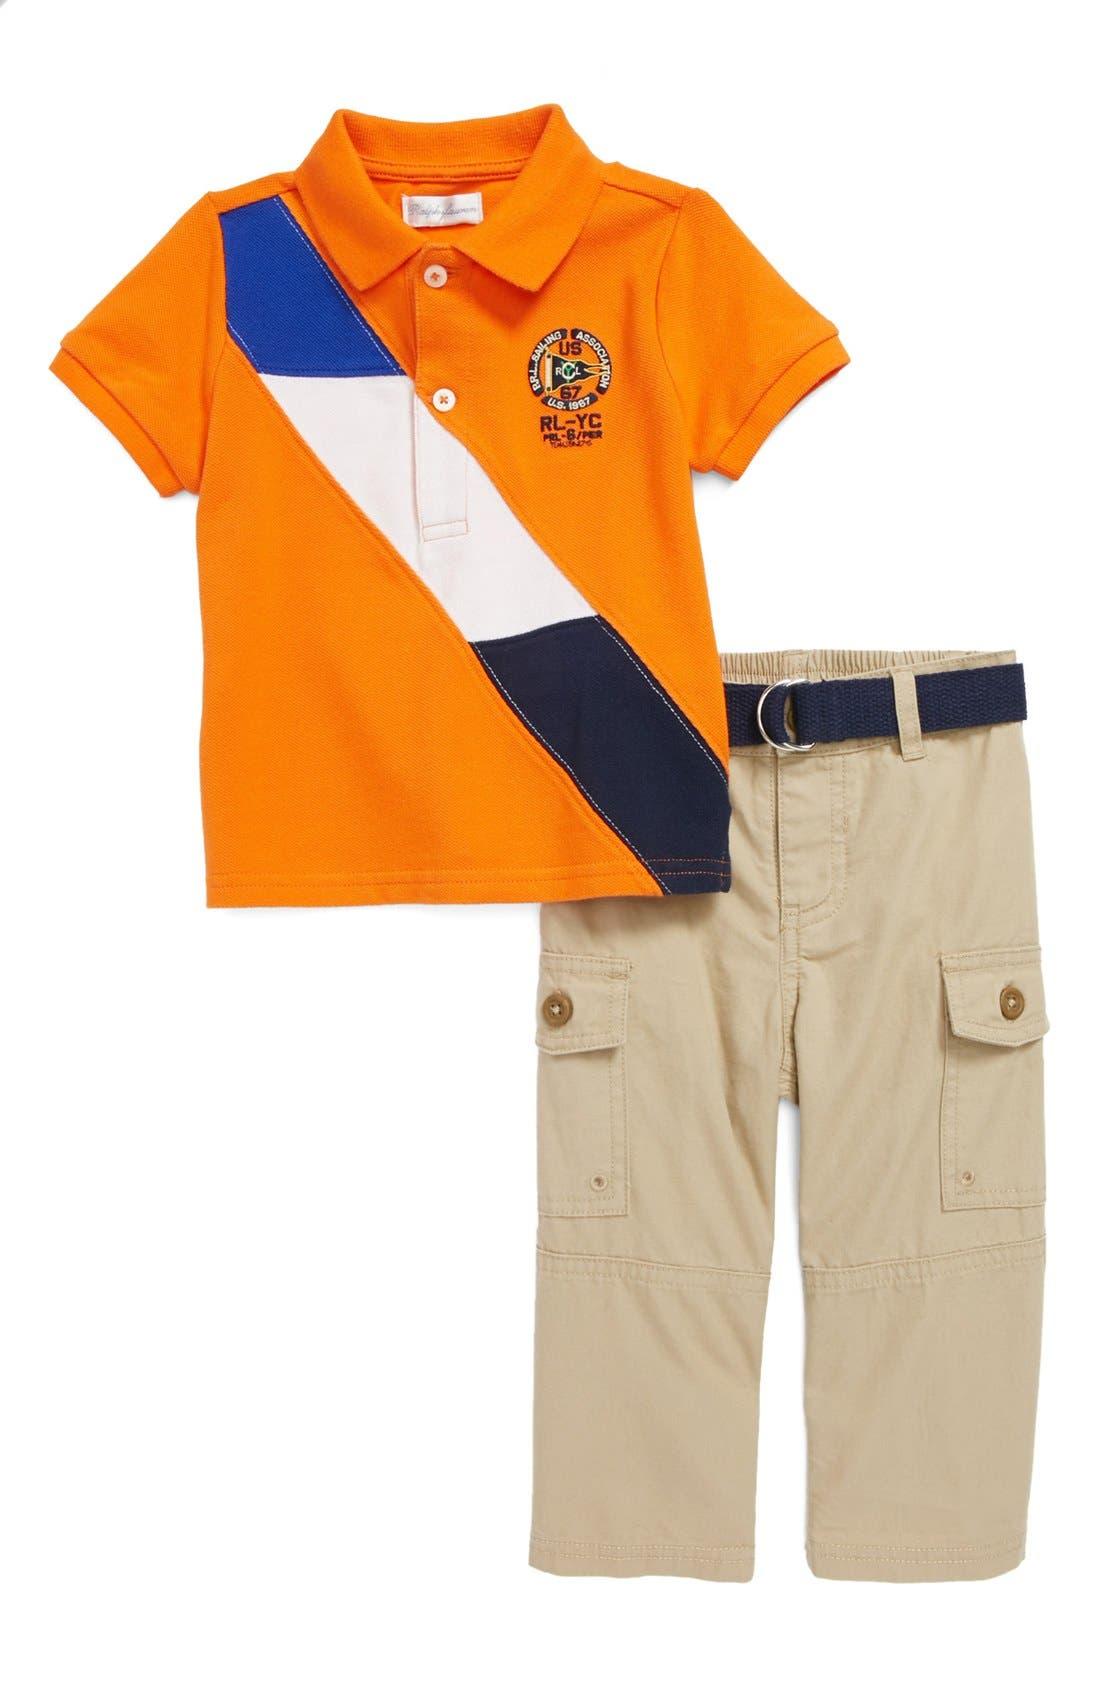 Alternate Image 1 Selected - Ralph Lauren Polo & Woven Pants (Baby Boys)